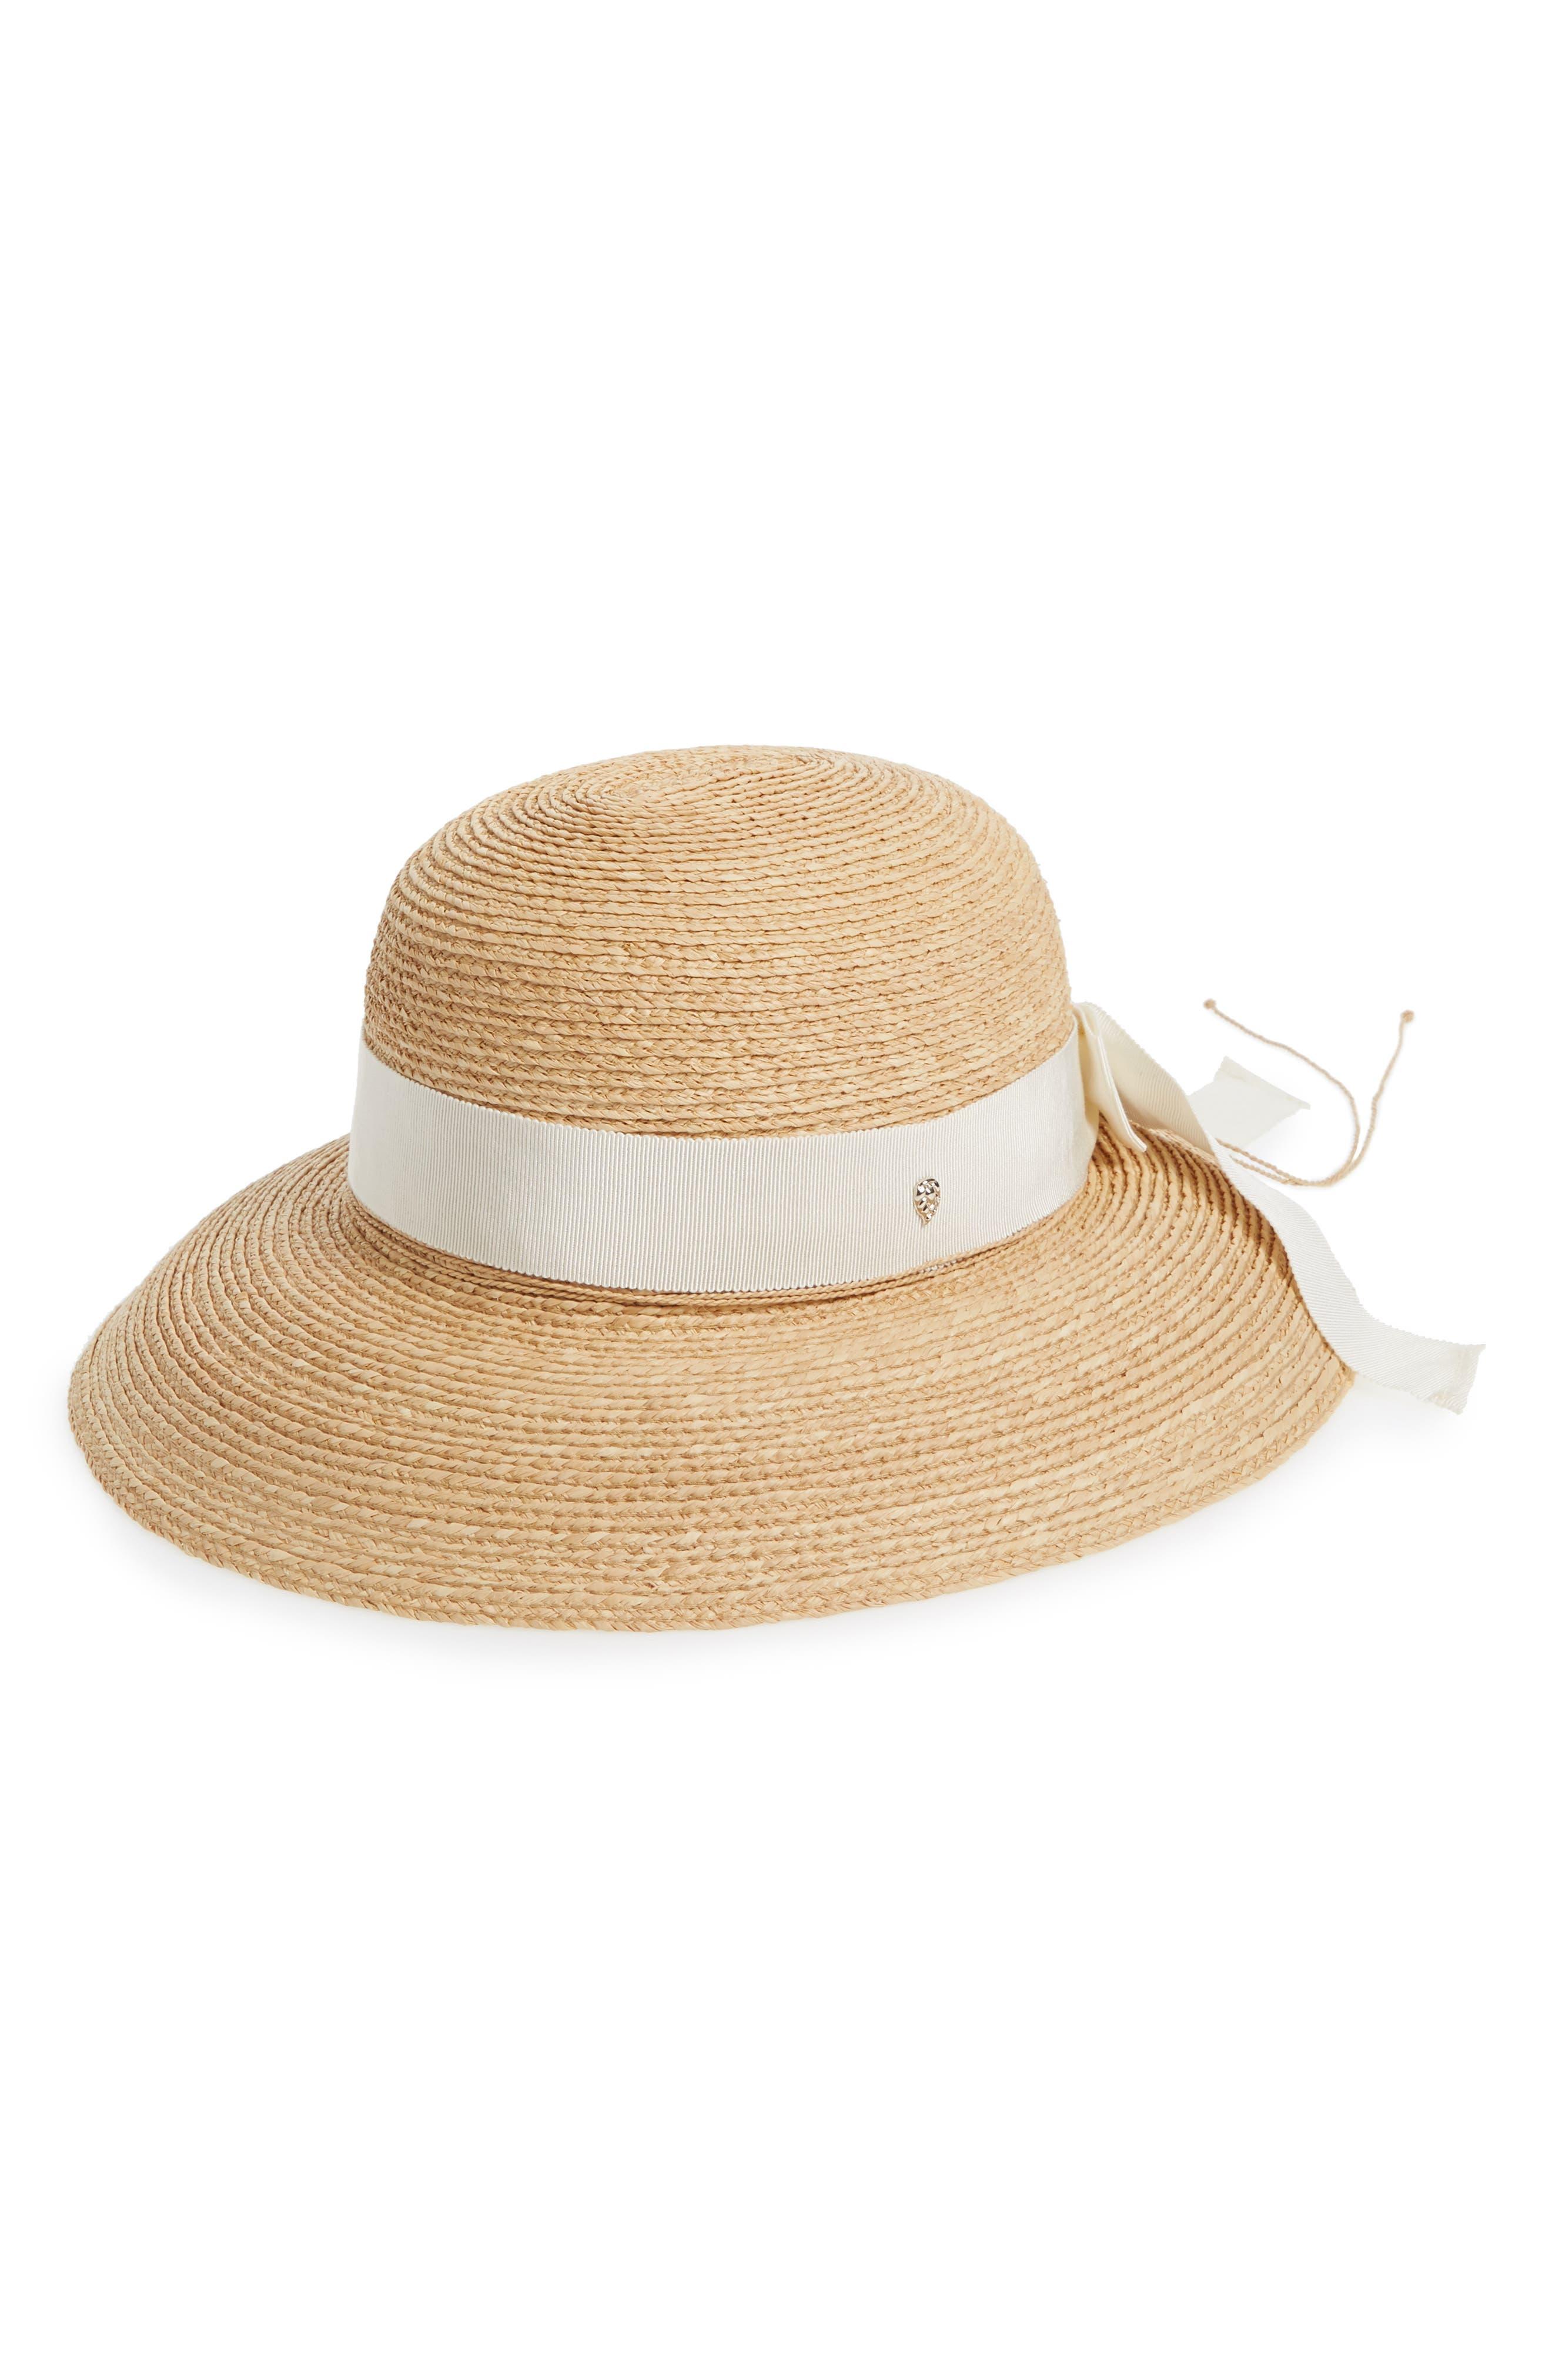 Newport Raffia Straw Hat by Helen Kaminski